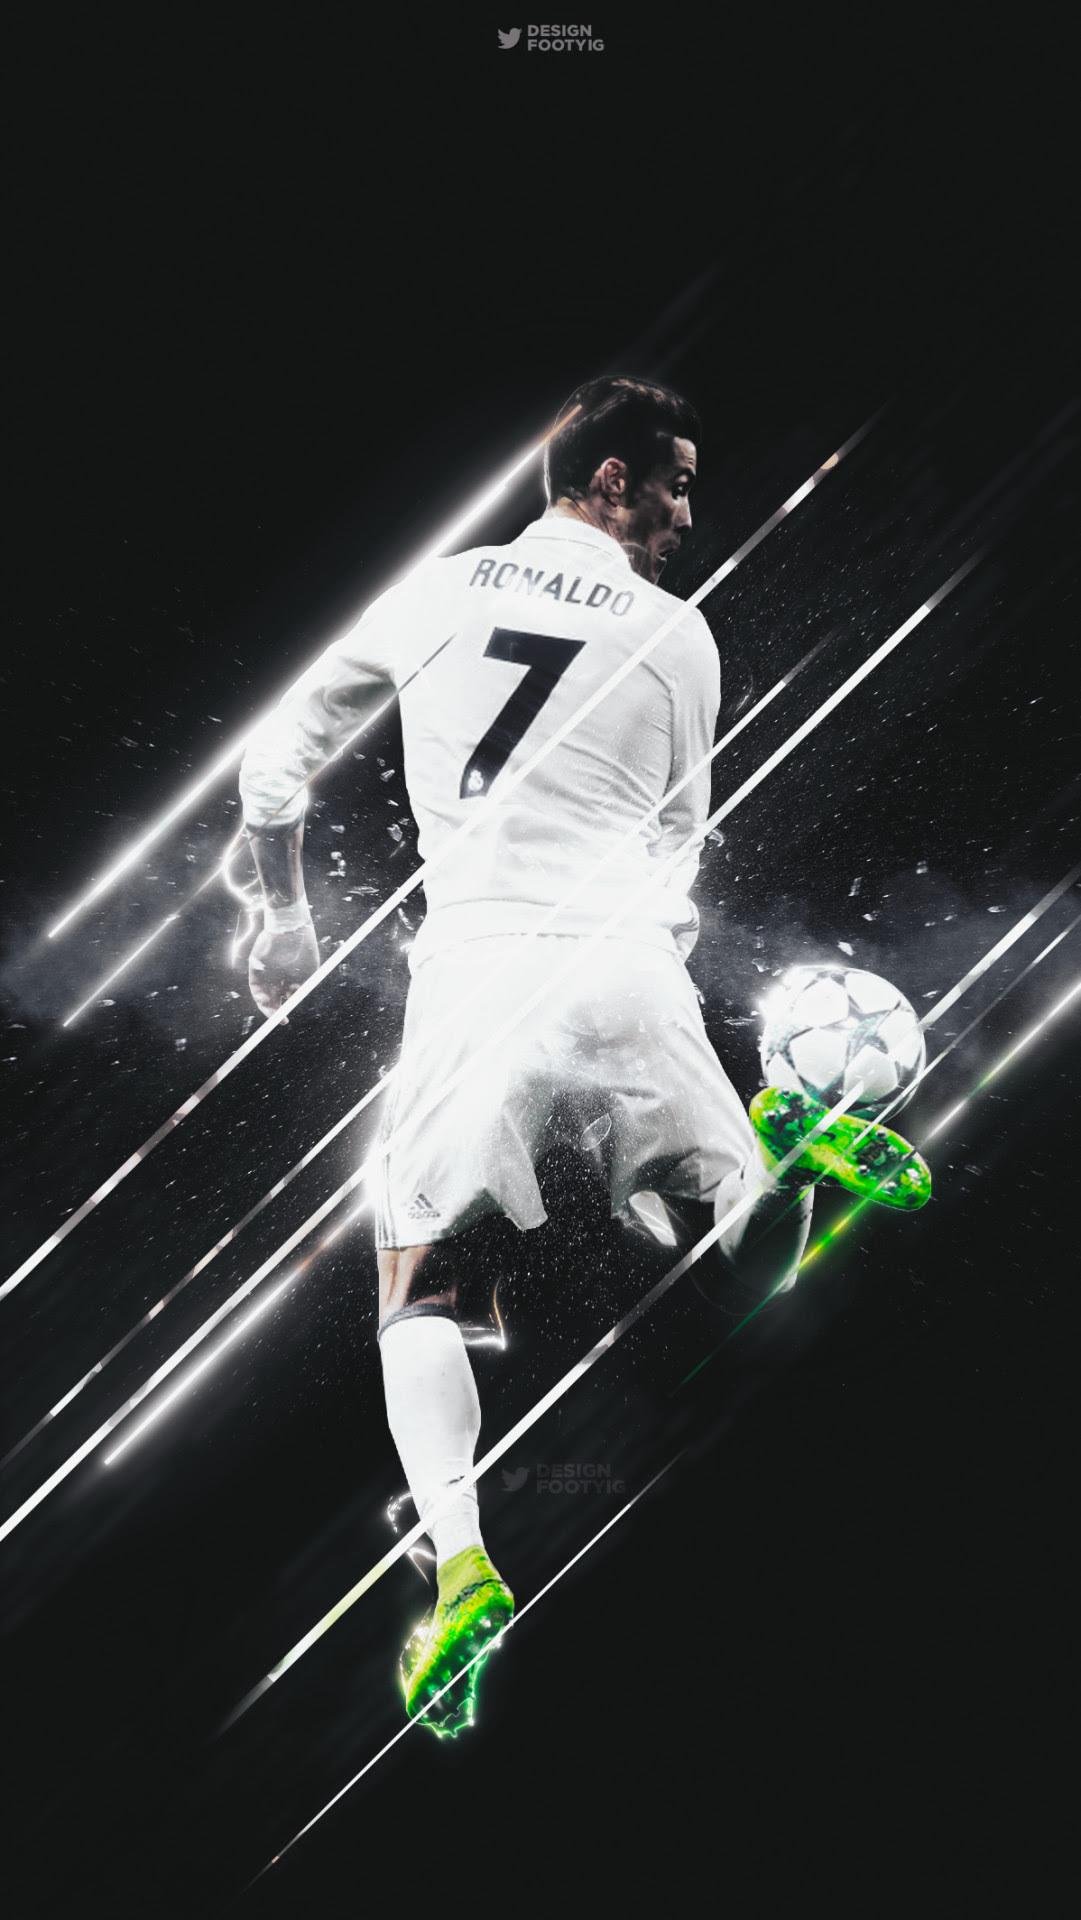 Cristiano Ronaldo Wallpaper 2018 Real Madrid 73 Images